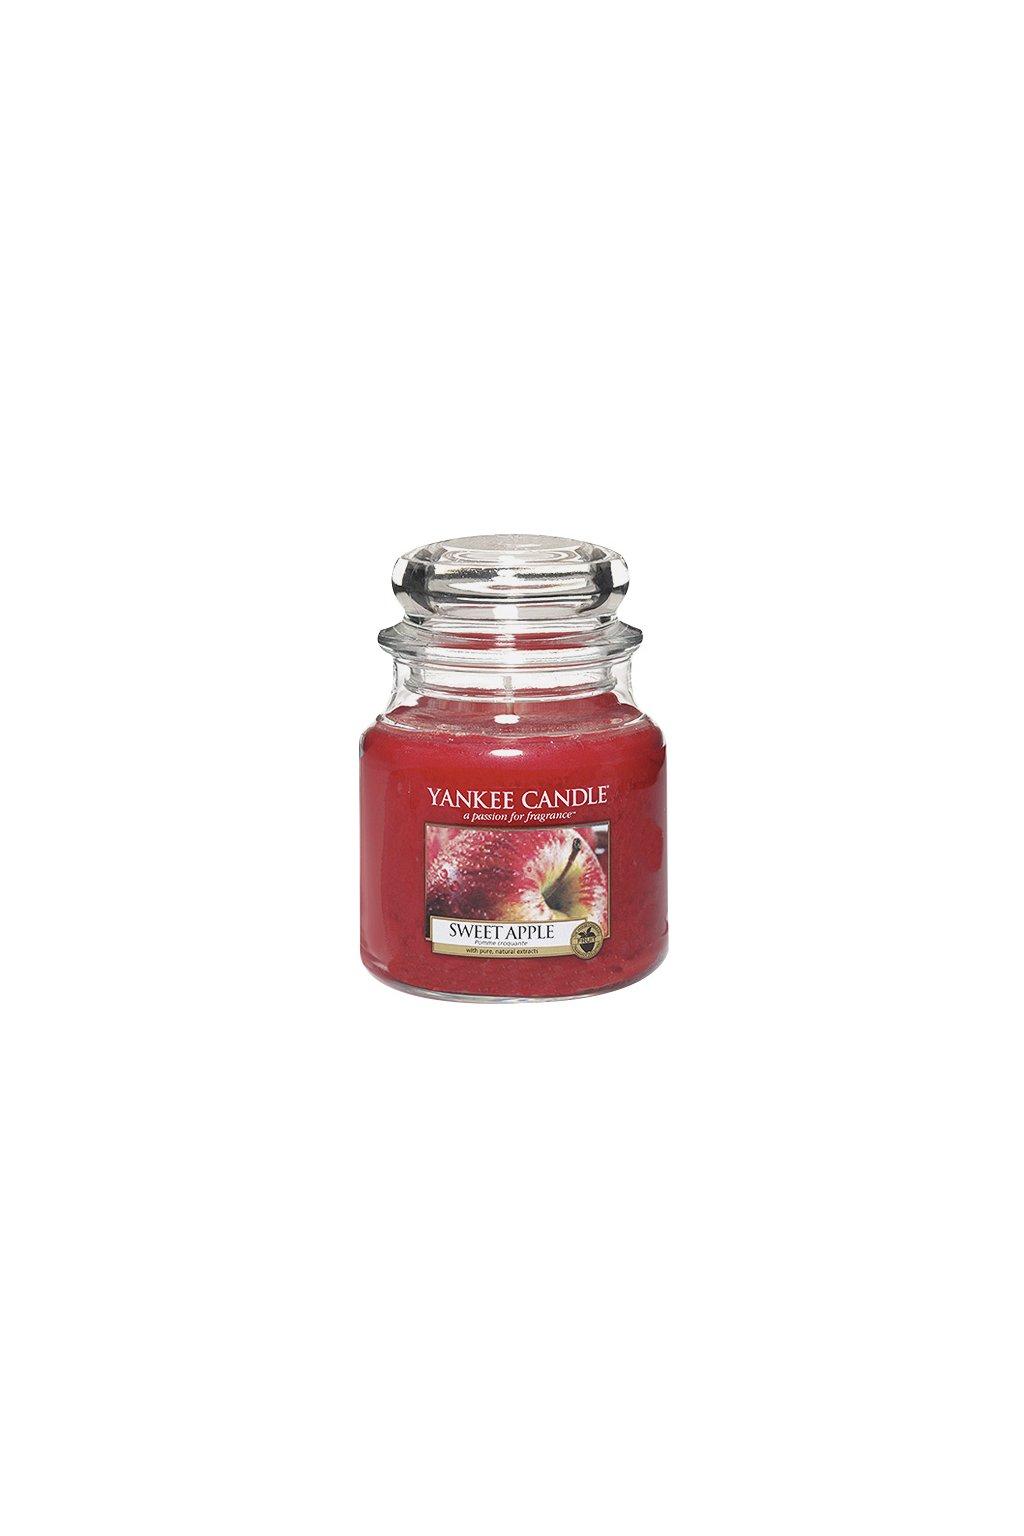 Yankee Candle Sweet Apple 411g